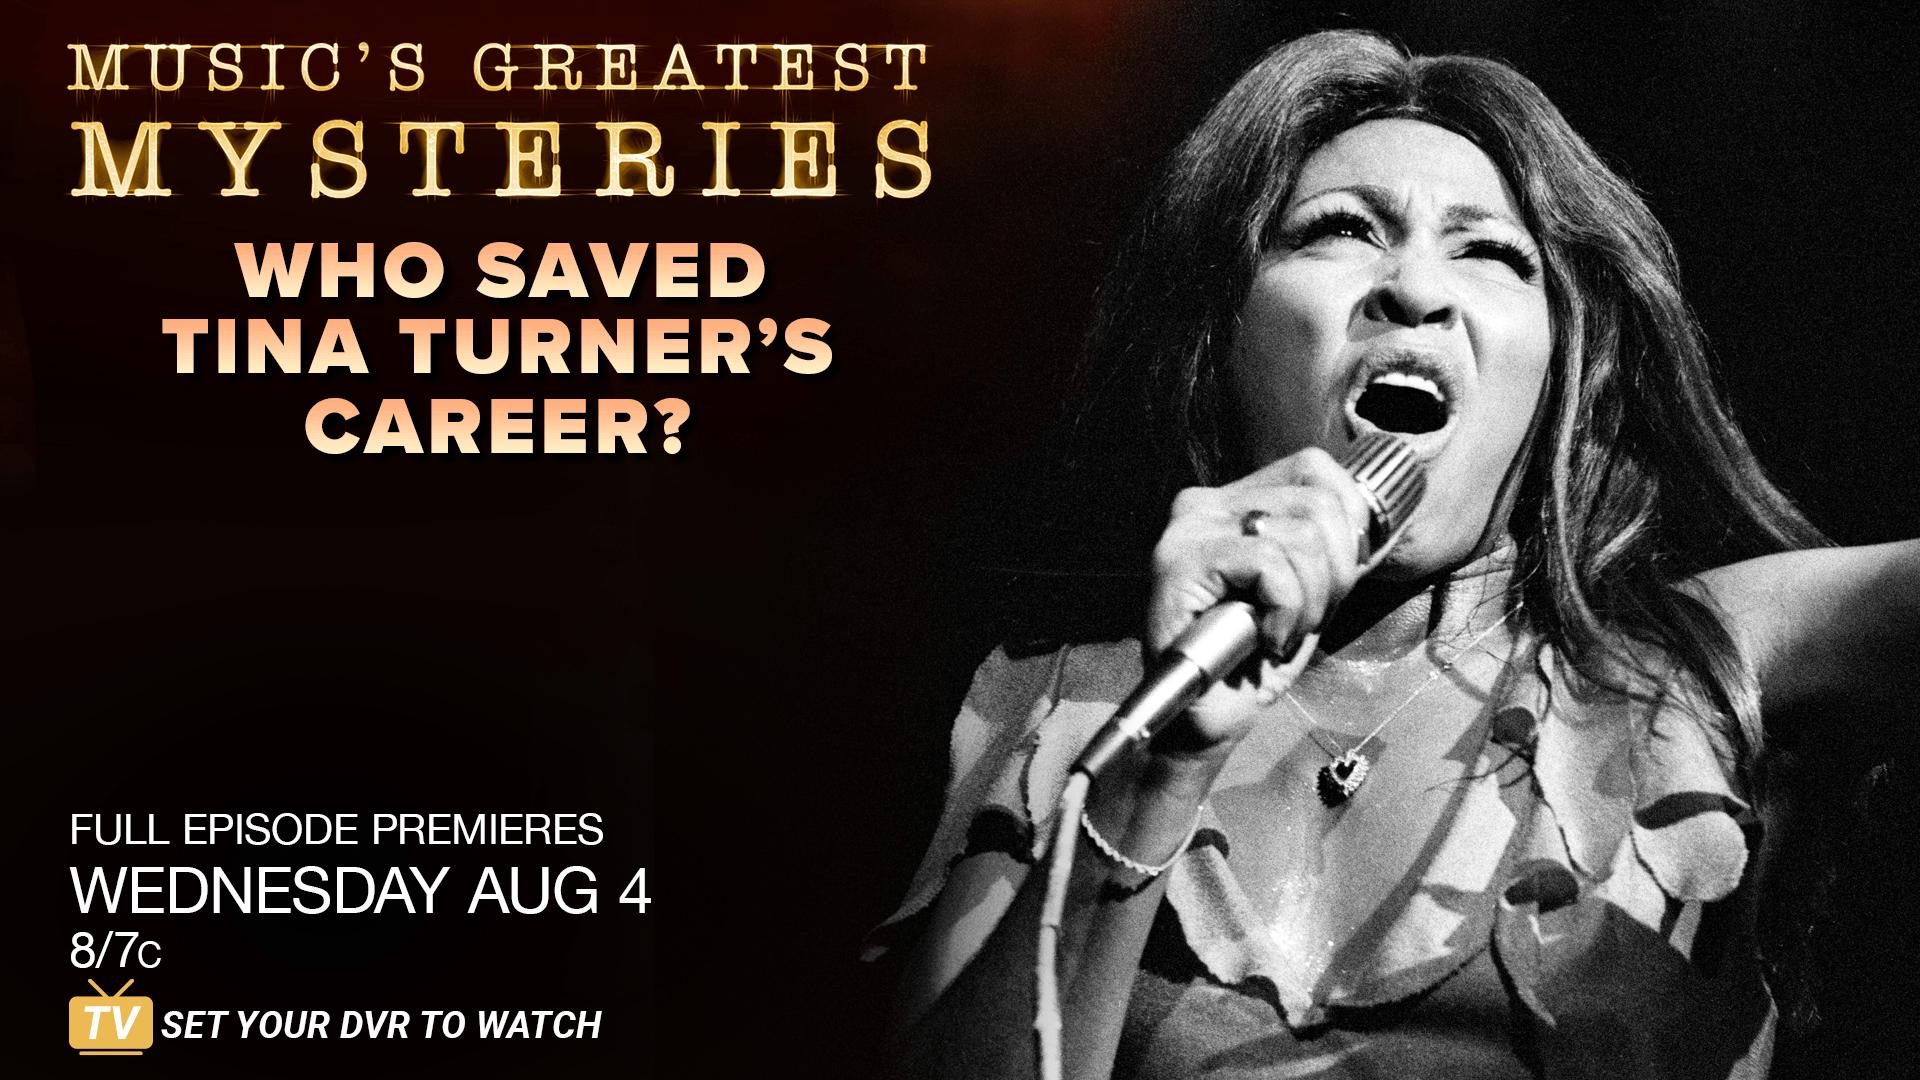 SNEAK PEEK: Who Saved Tina Turner's Career? | Music's Greatest Mysteries